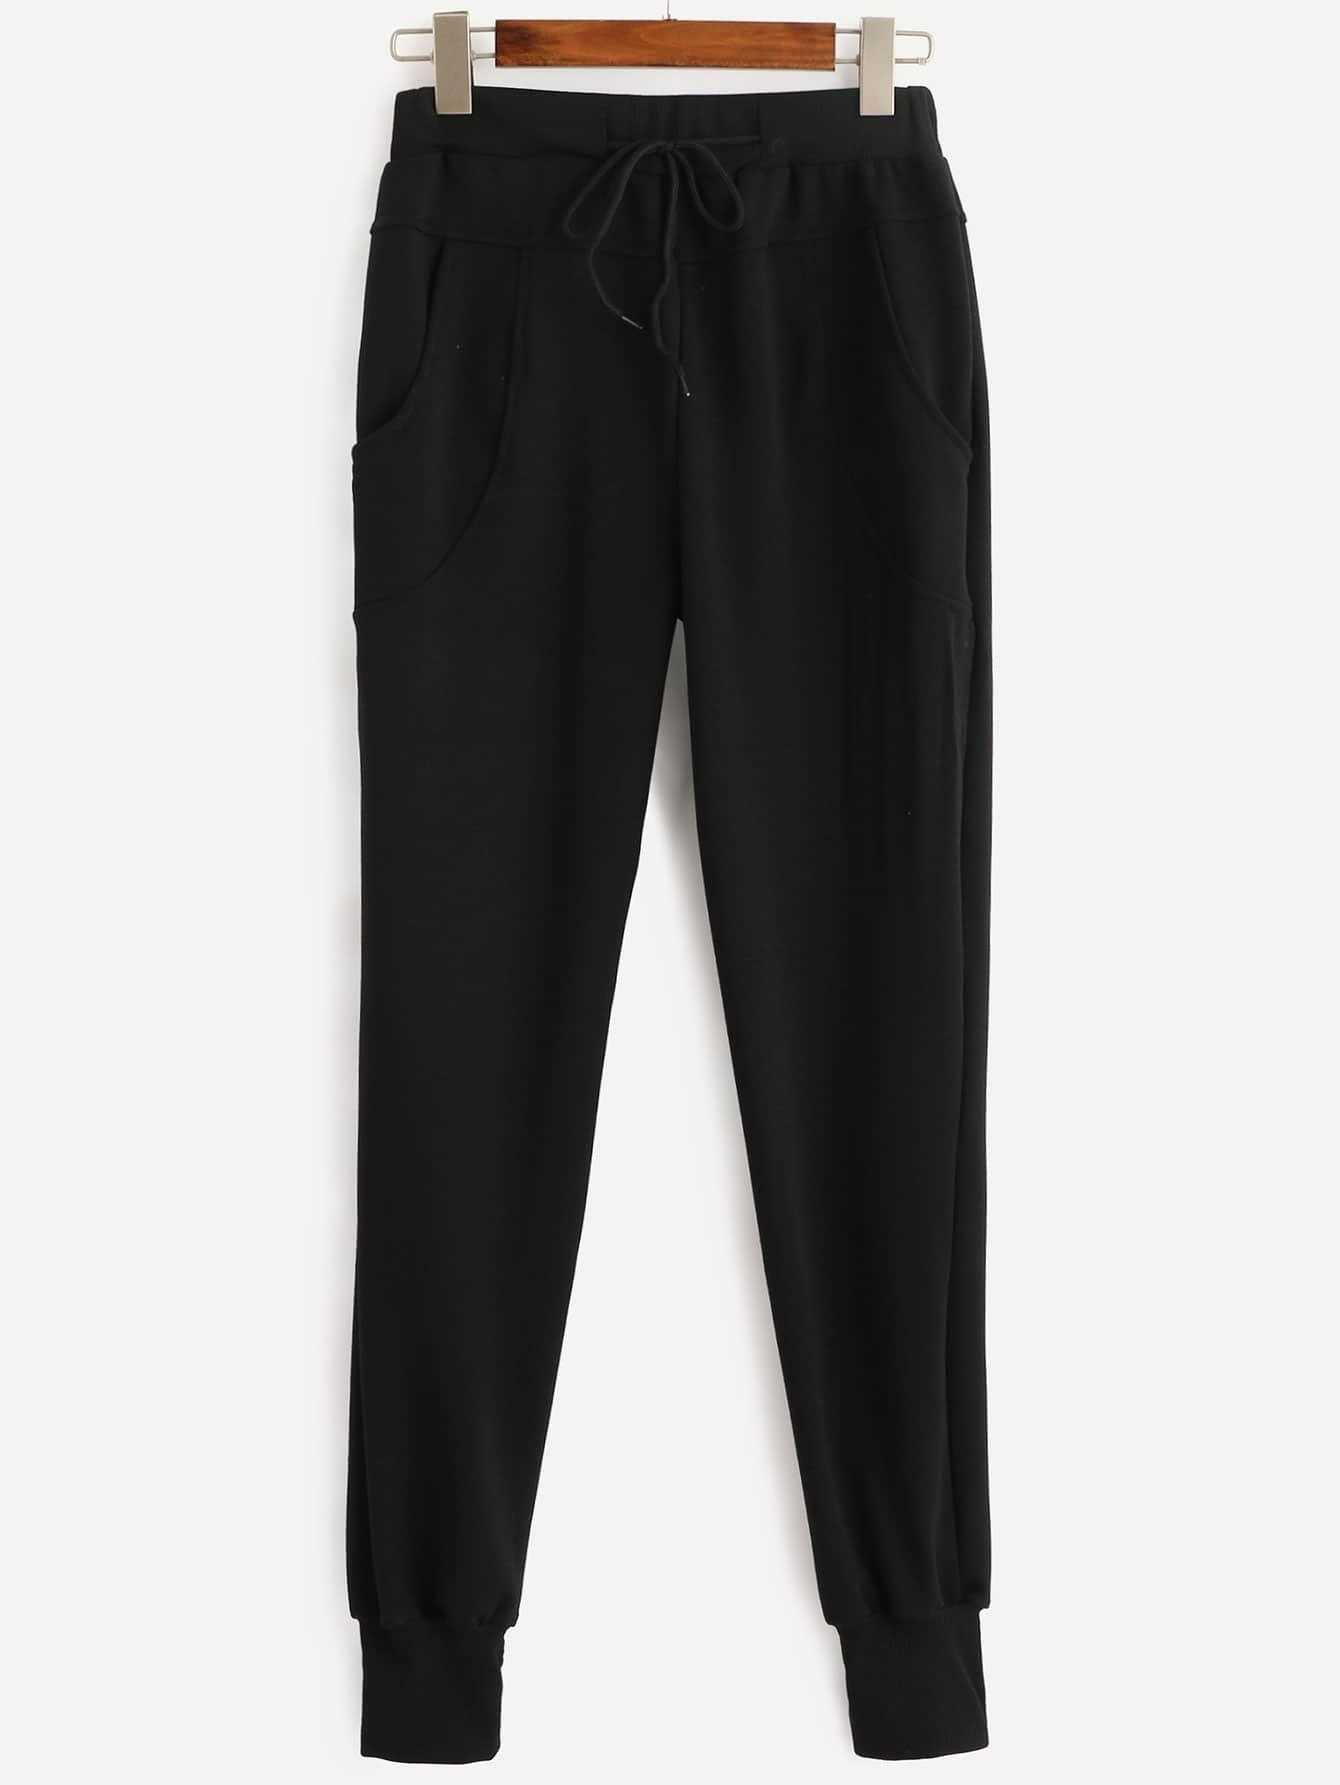 Drawstring Waist Pants RPAN160810101